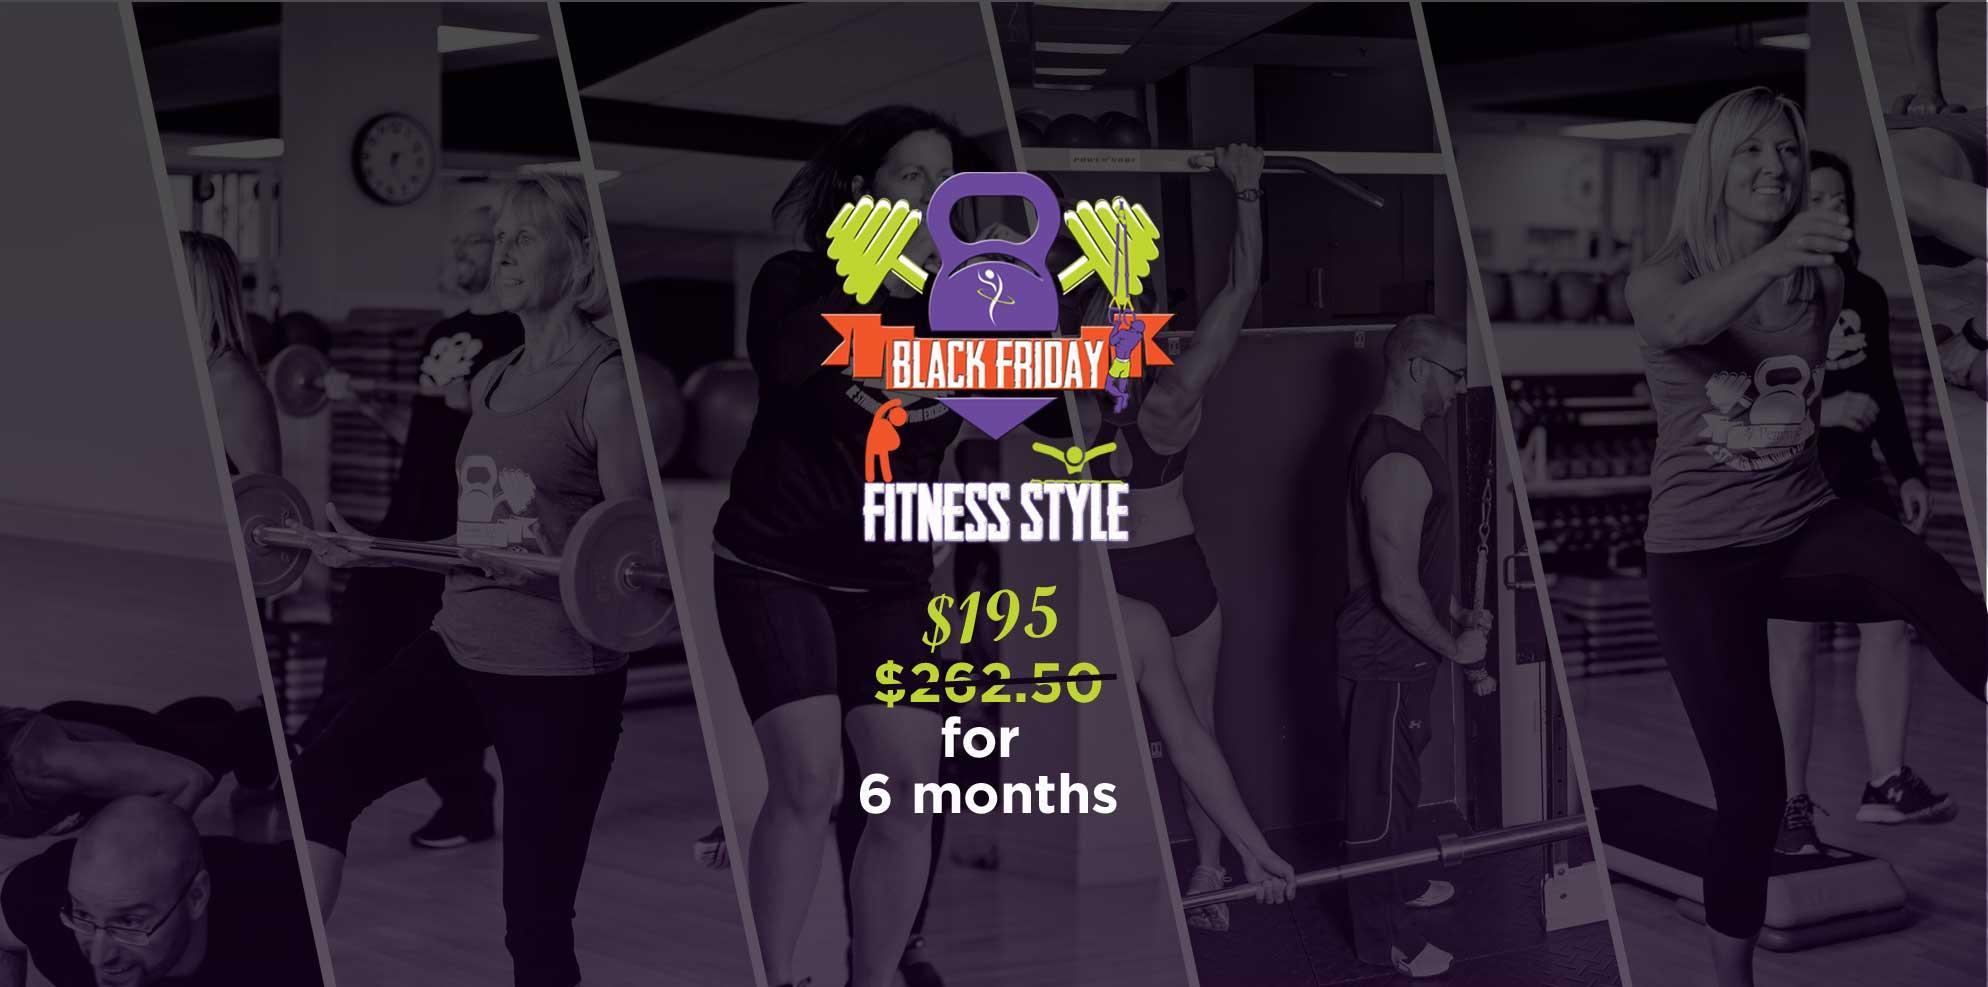 Black Friday Fitness Deal 2020